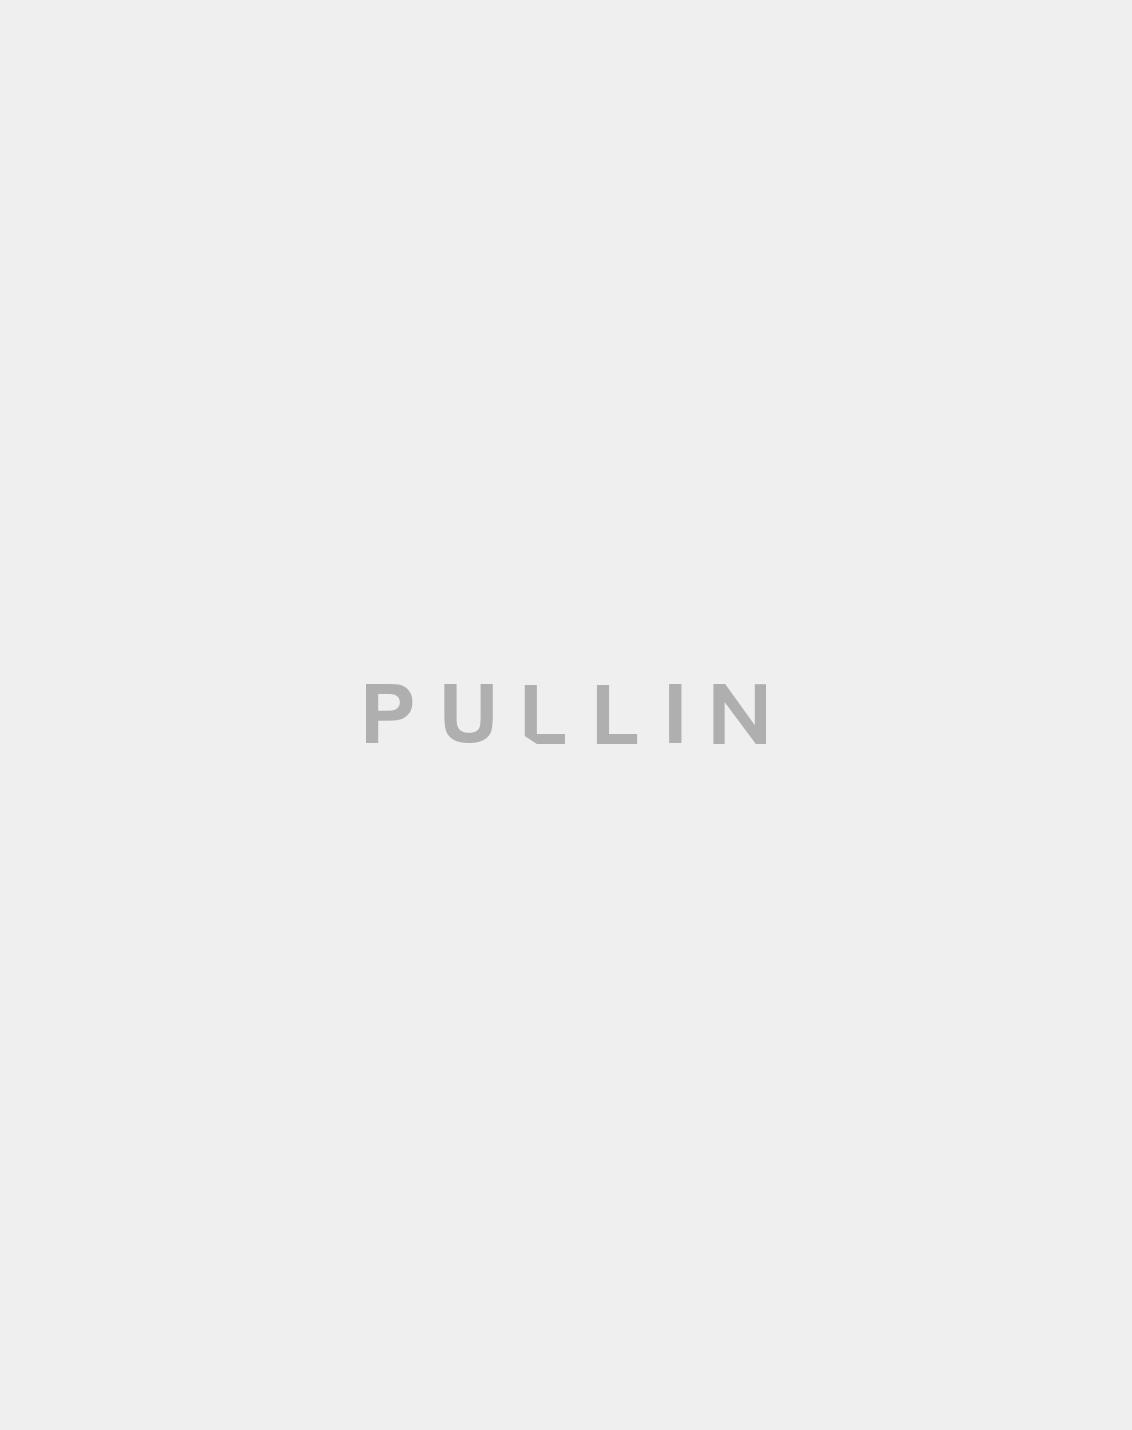 Key holder bp0867 unisex - pullin 2